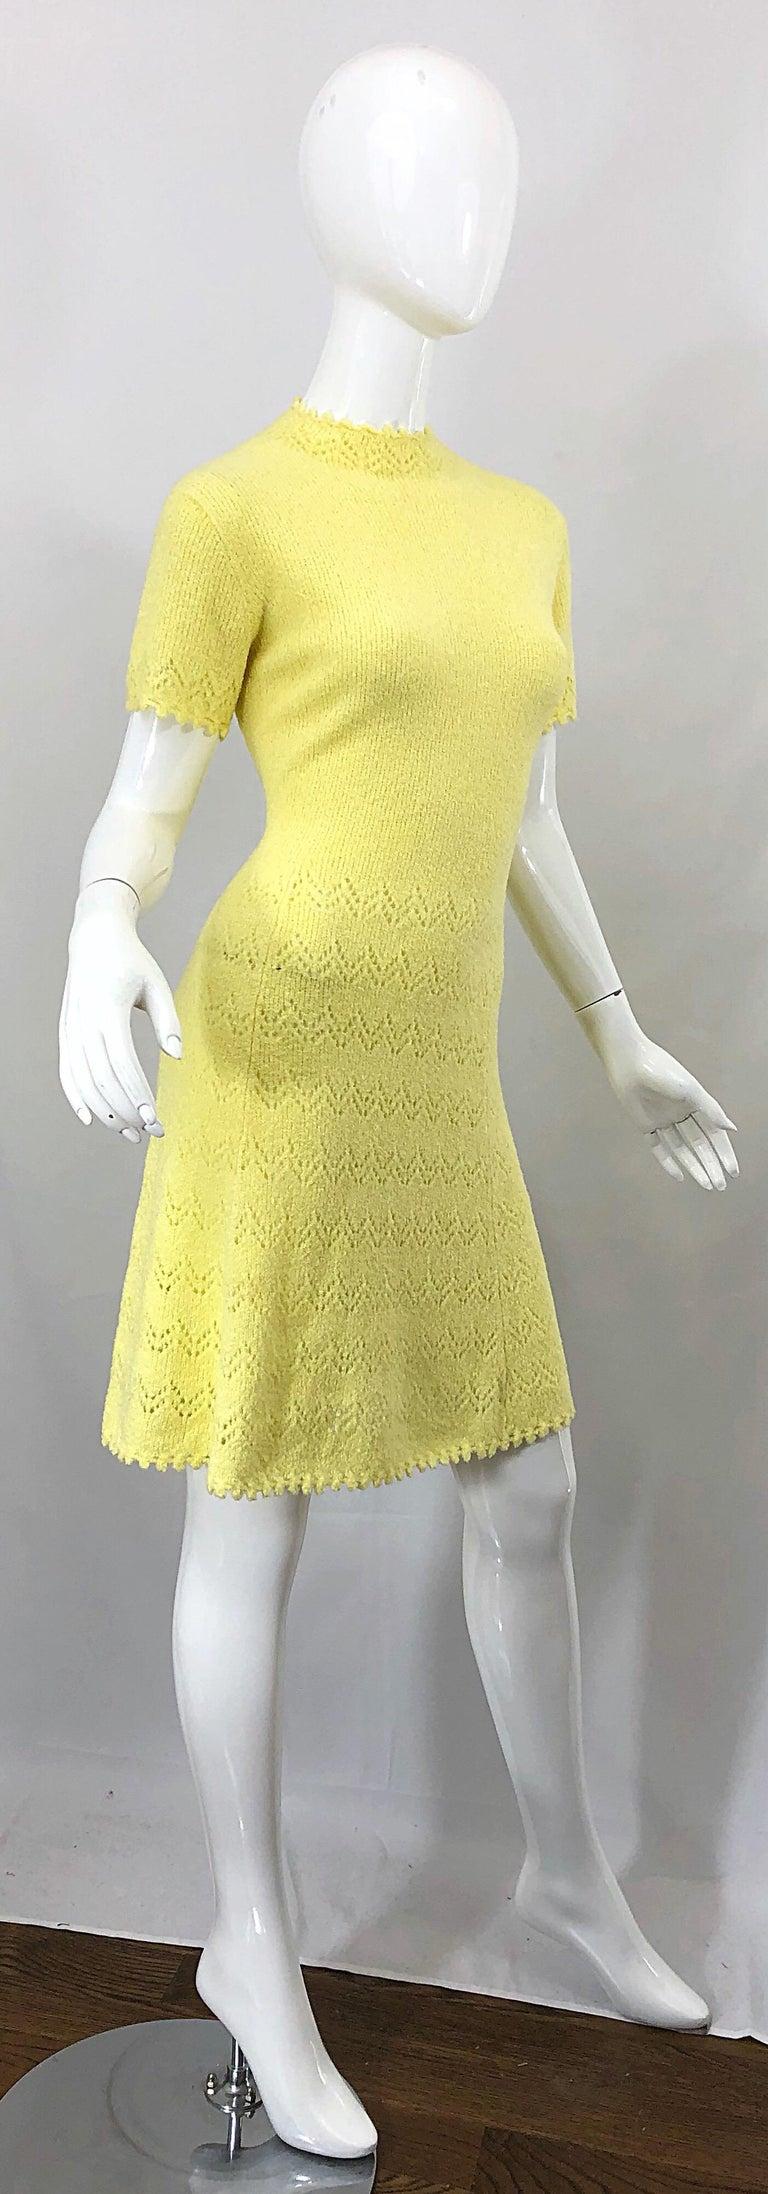 1960s St John Canary Yellow Santana Knit Mod Crochet Vintage A Line 60s Dress For Sale 6